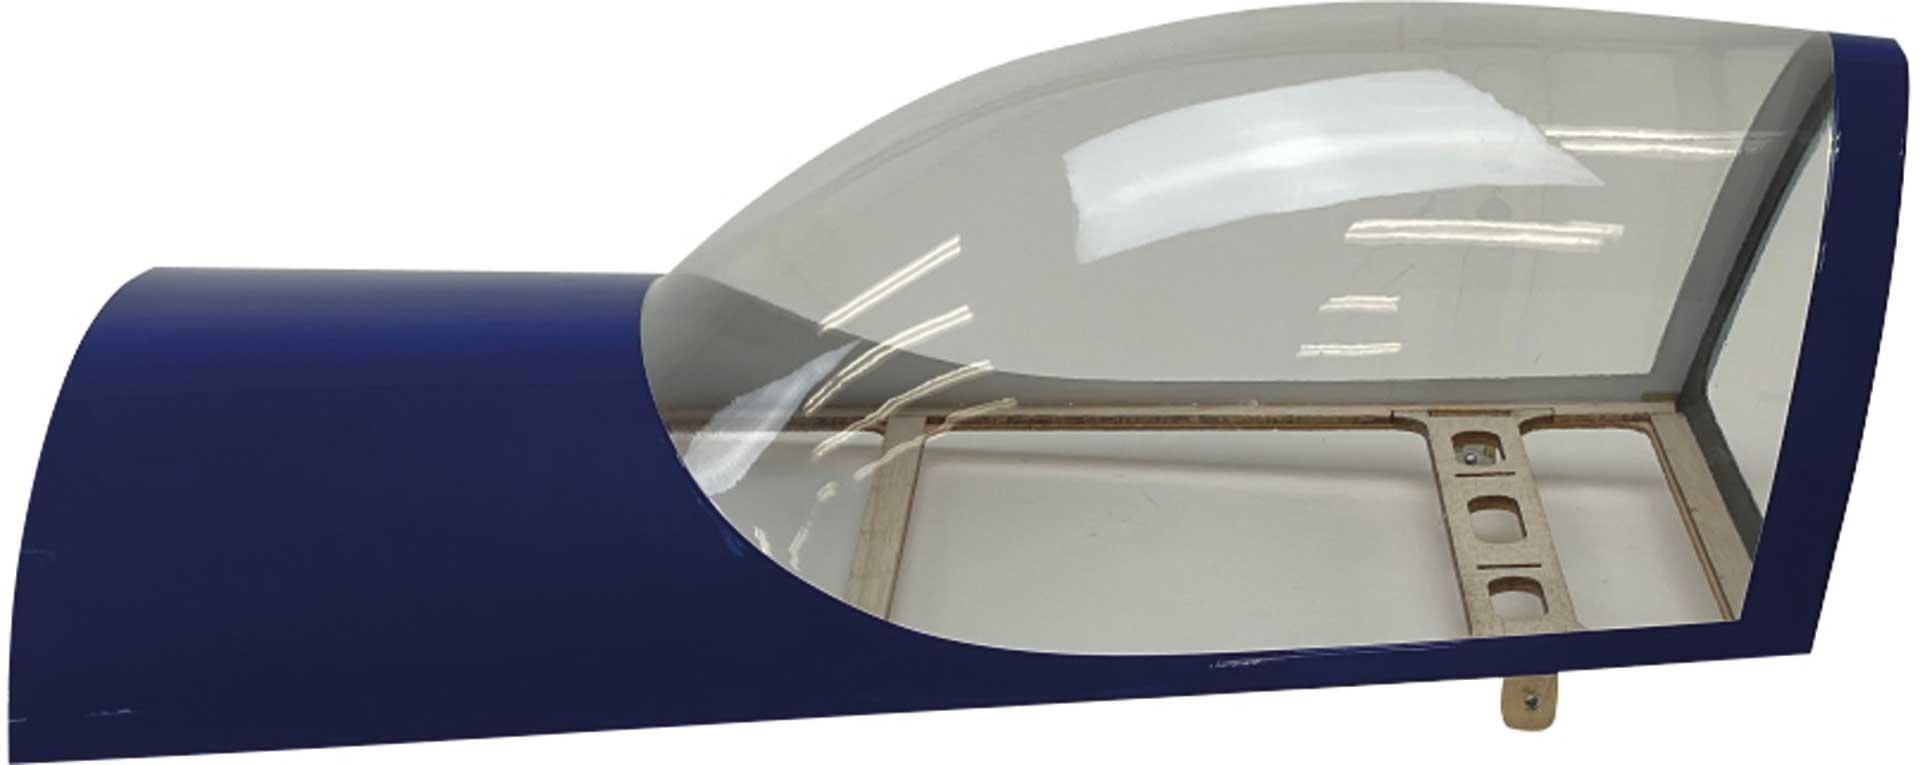 PREMIER AIRCRAFT Canopy Blue Mamba 120cc